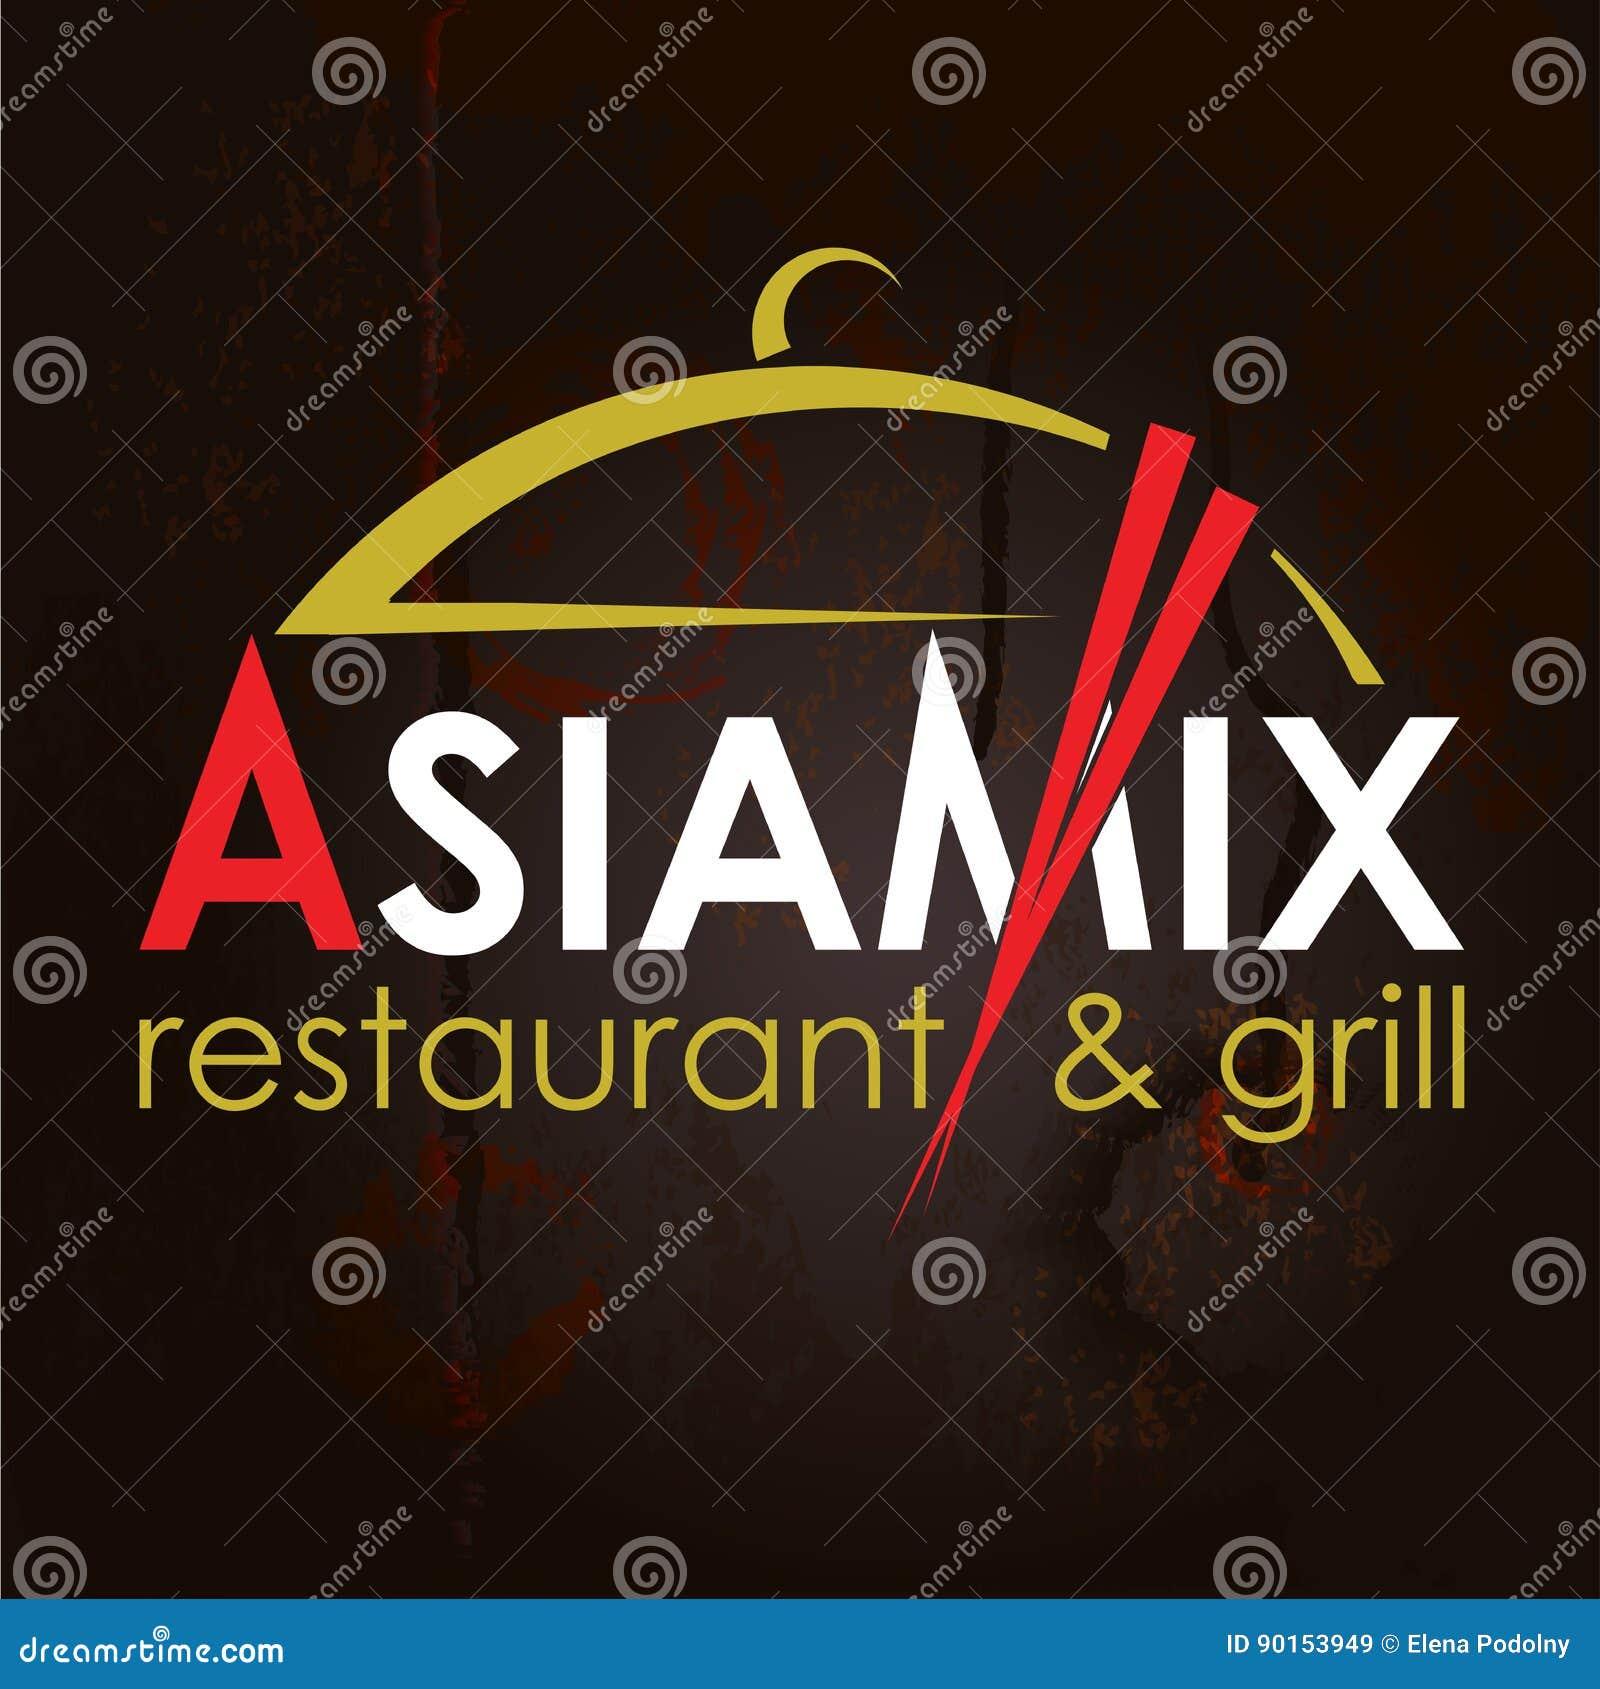 Asian food logo stock vector illustration of asia